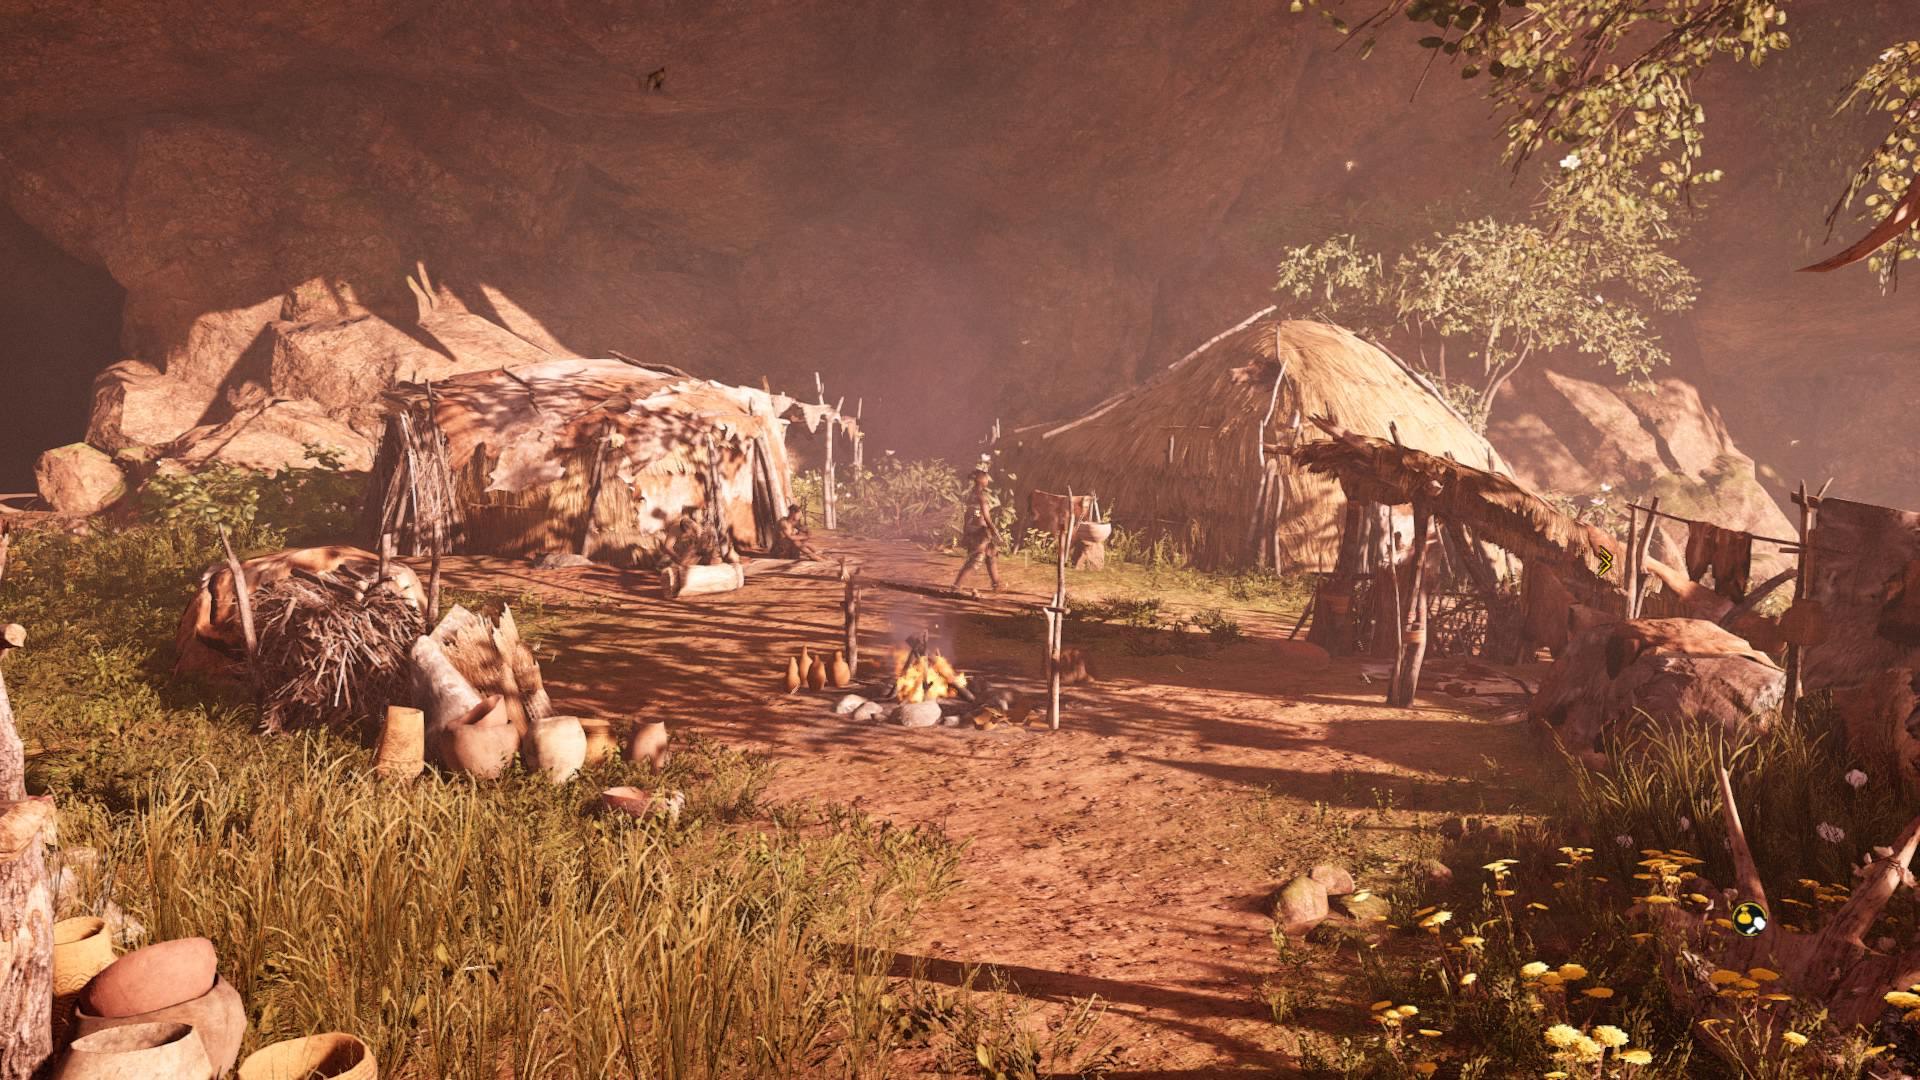 поселение винджа Far cry primal, племя